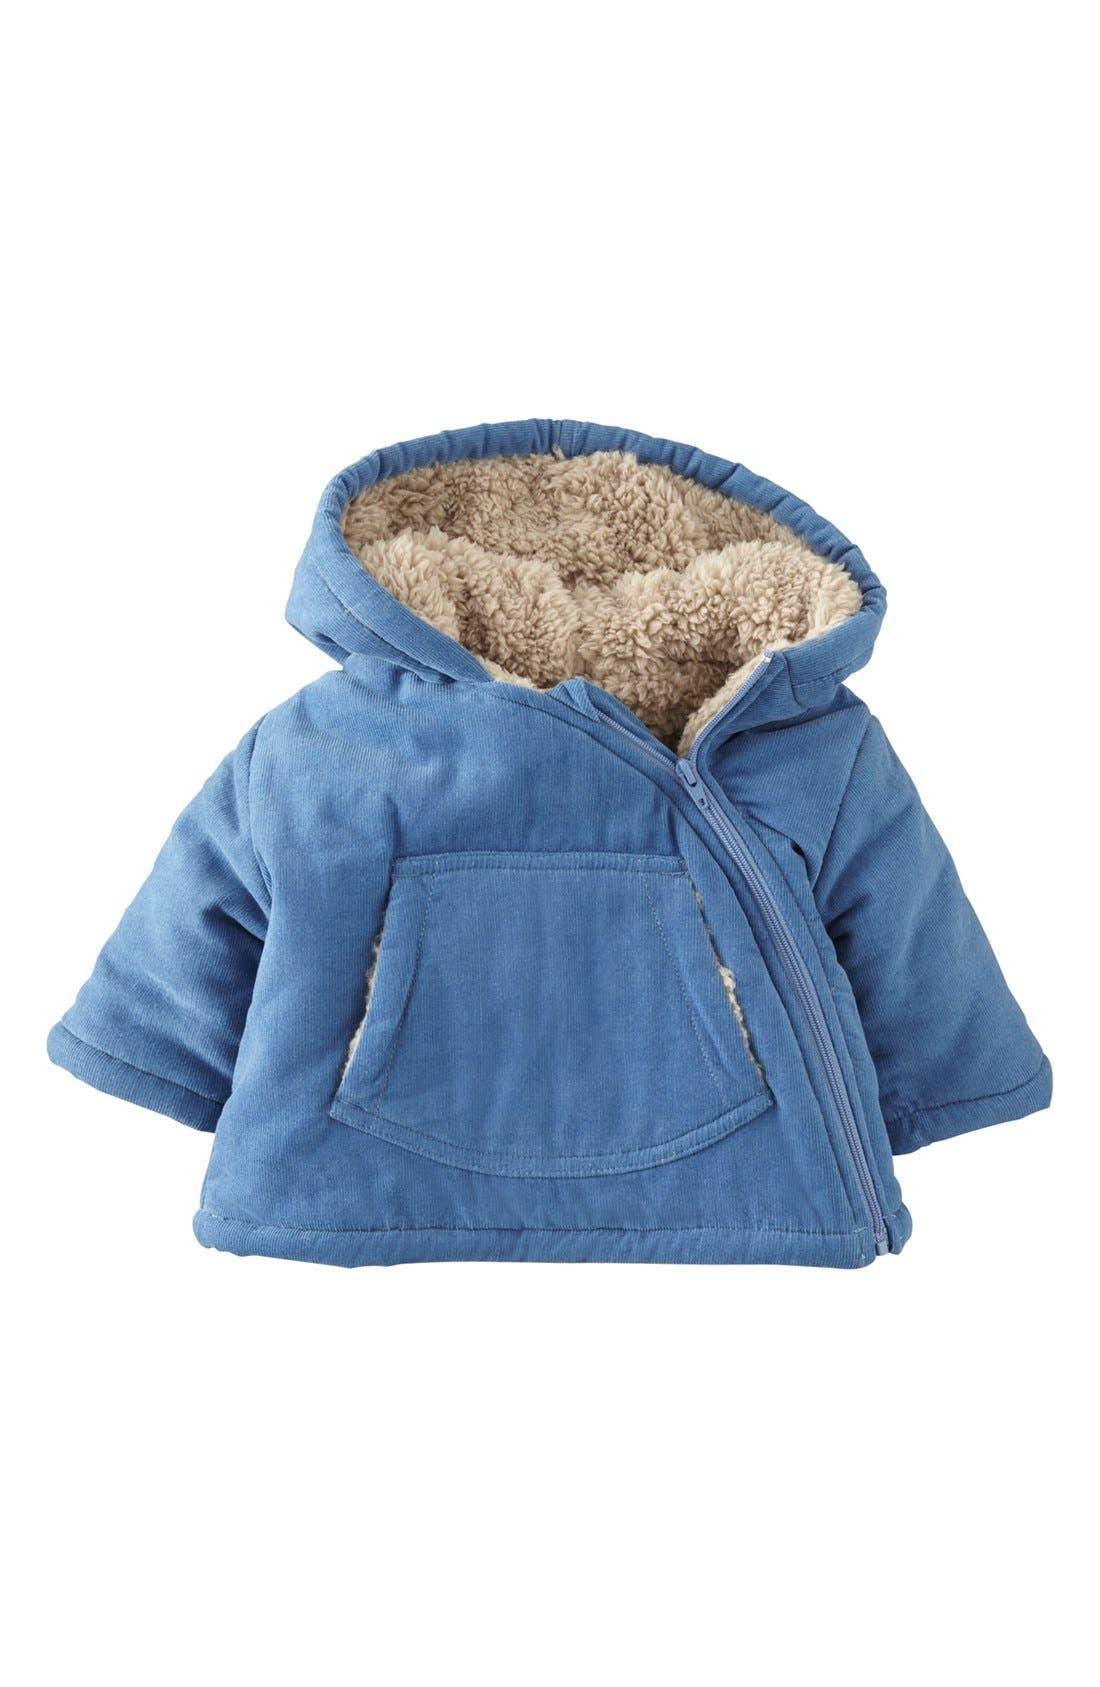 Alternate Image 1 Selected - Mini Boden Corduroy Jacket (Baby Girls)